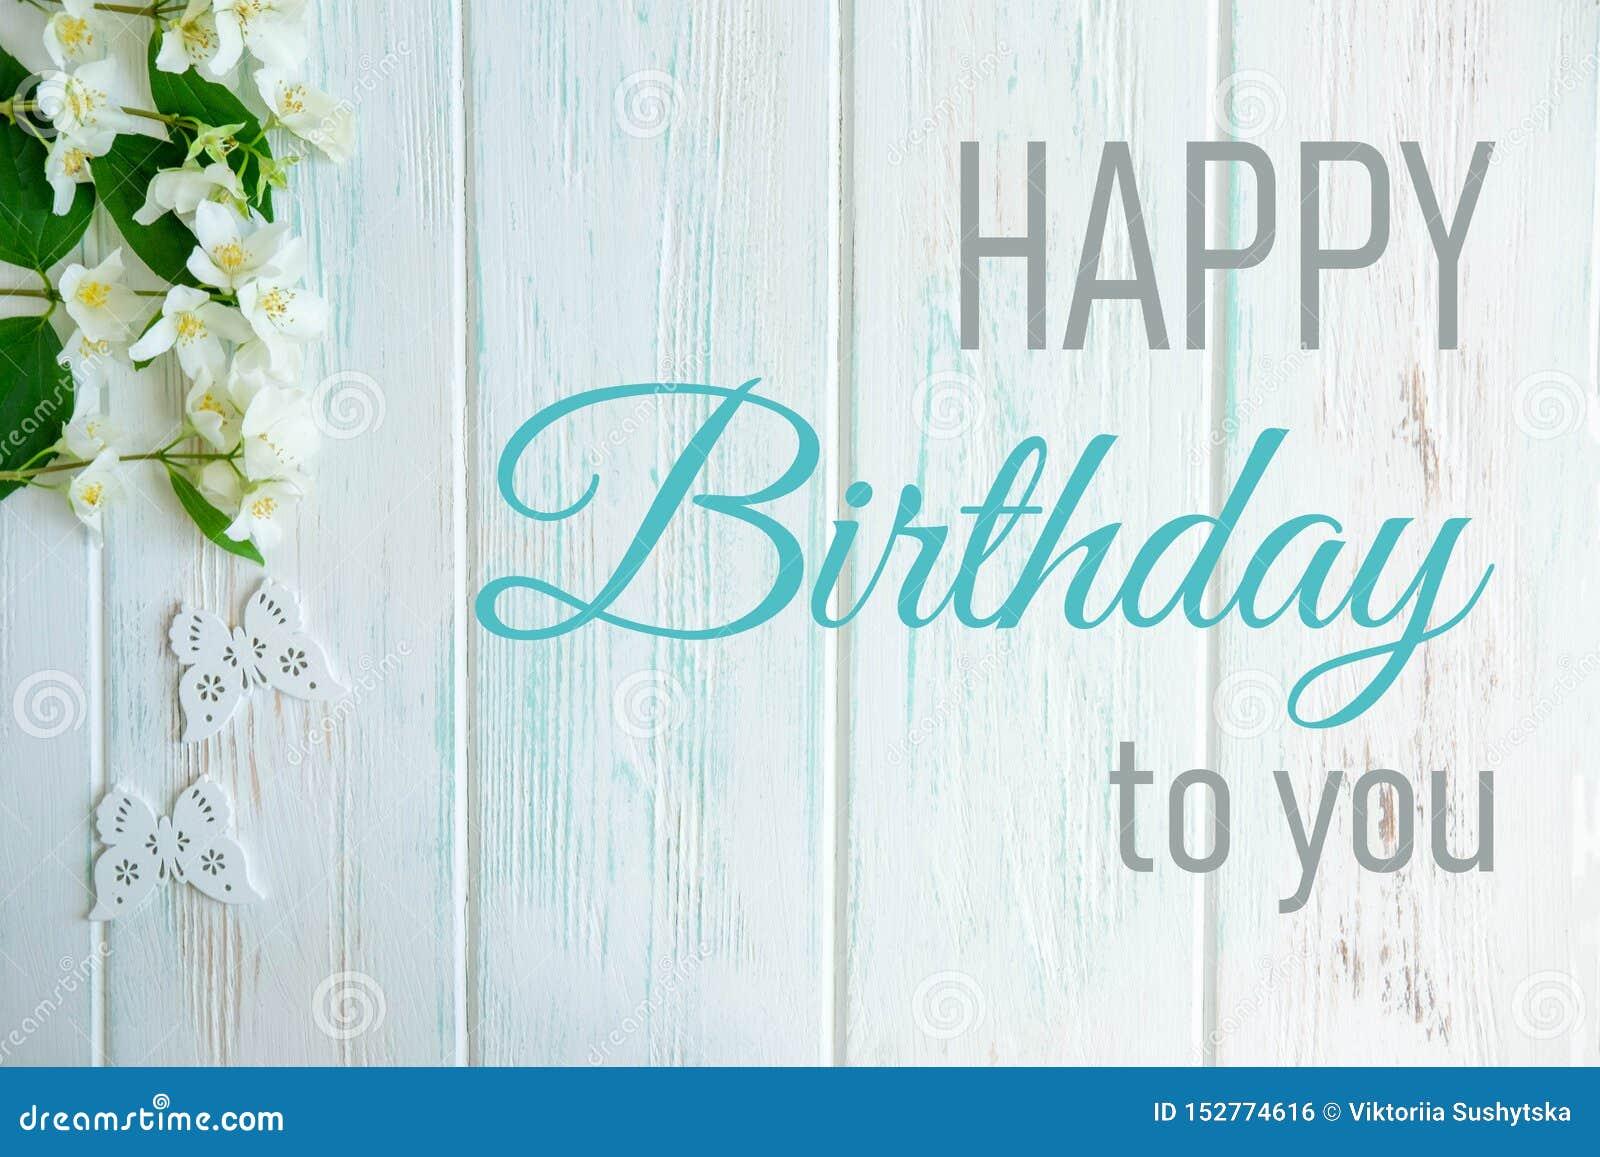 Happy Birthday Greeting Card With Jasmine Flowers On A Light